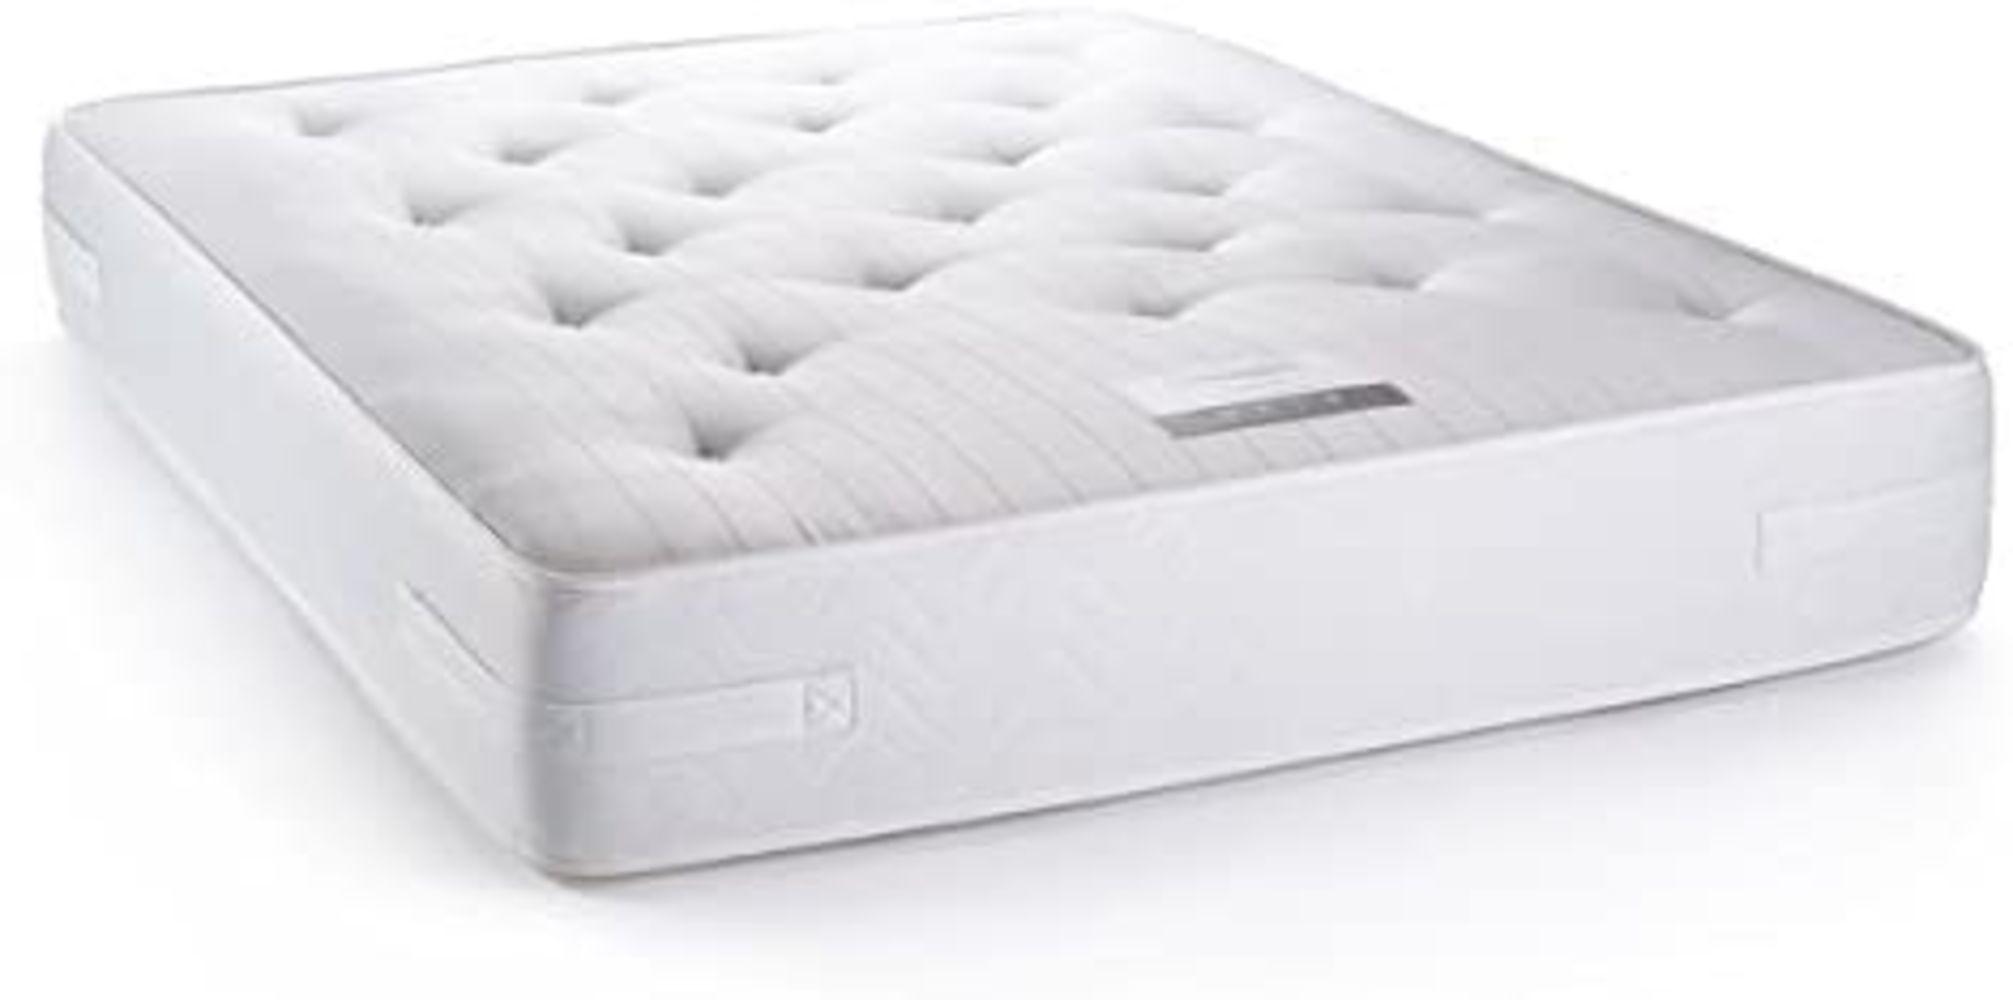 Overstocks From Major Oak Furniture Retailer - Brand New Mattresses, Oak Beds, Sideboards, Wardrobes, Bookcases Etc...